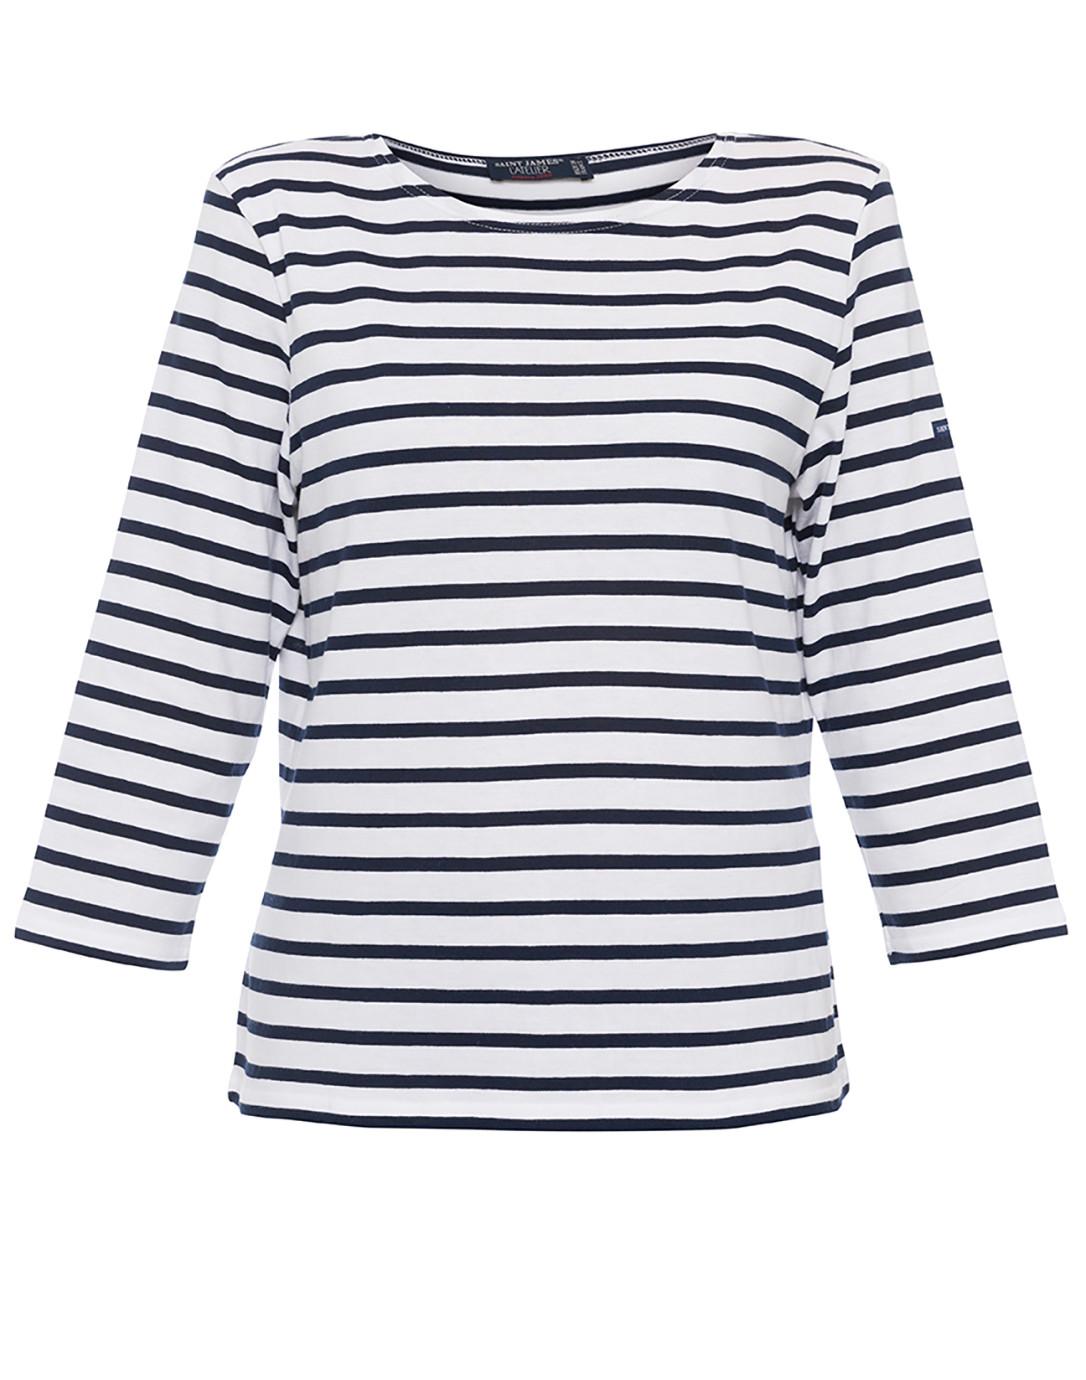 critico filtro Finito  Galathee White and Navy Striped Shirt | Saint James | Halsbrook